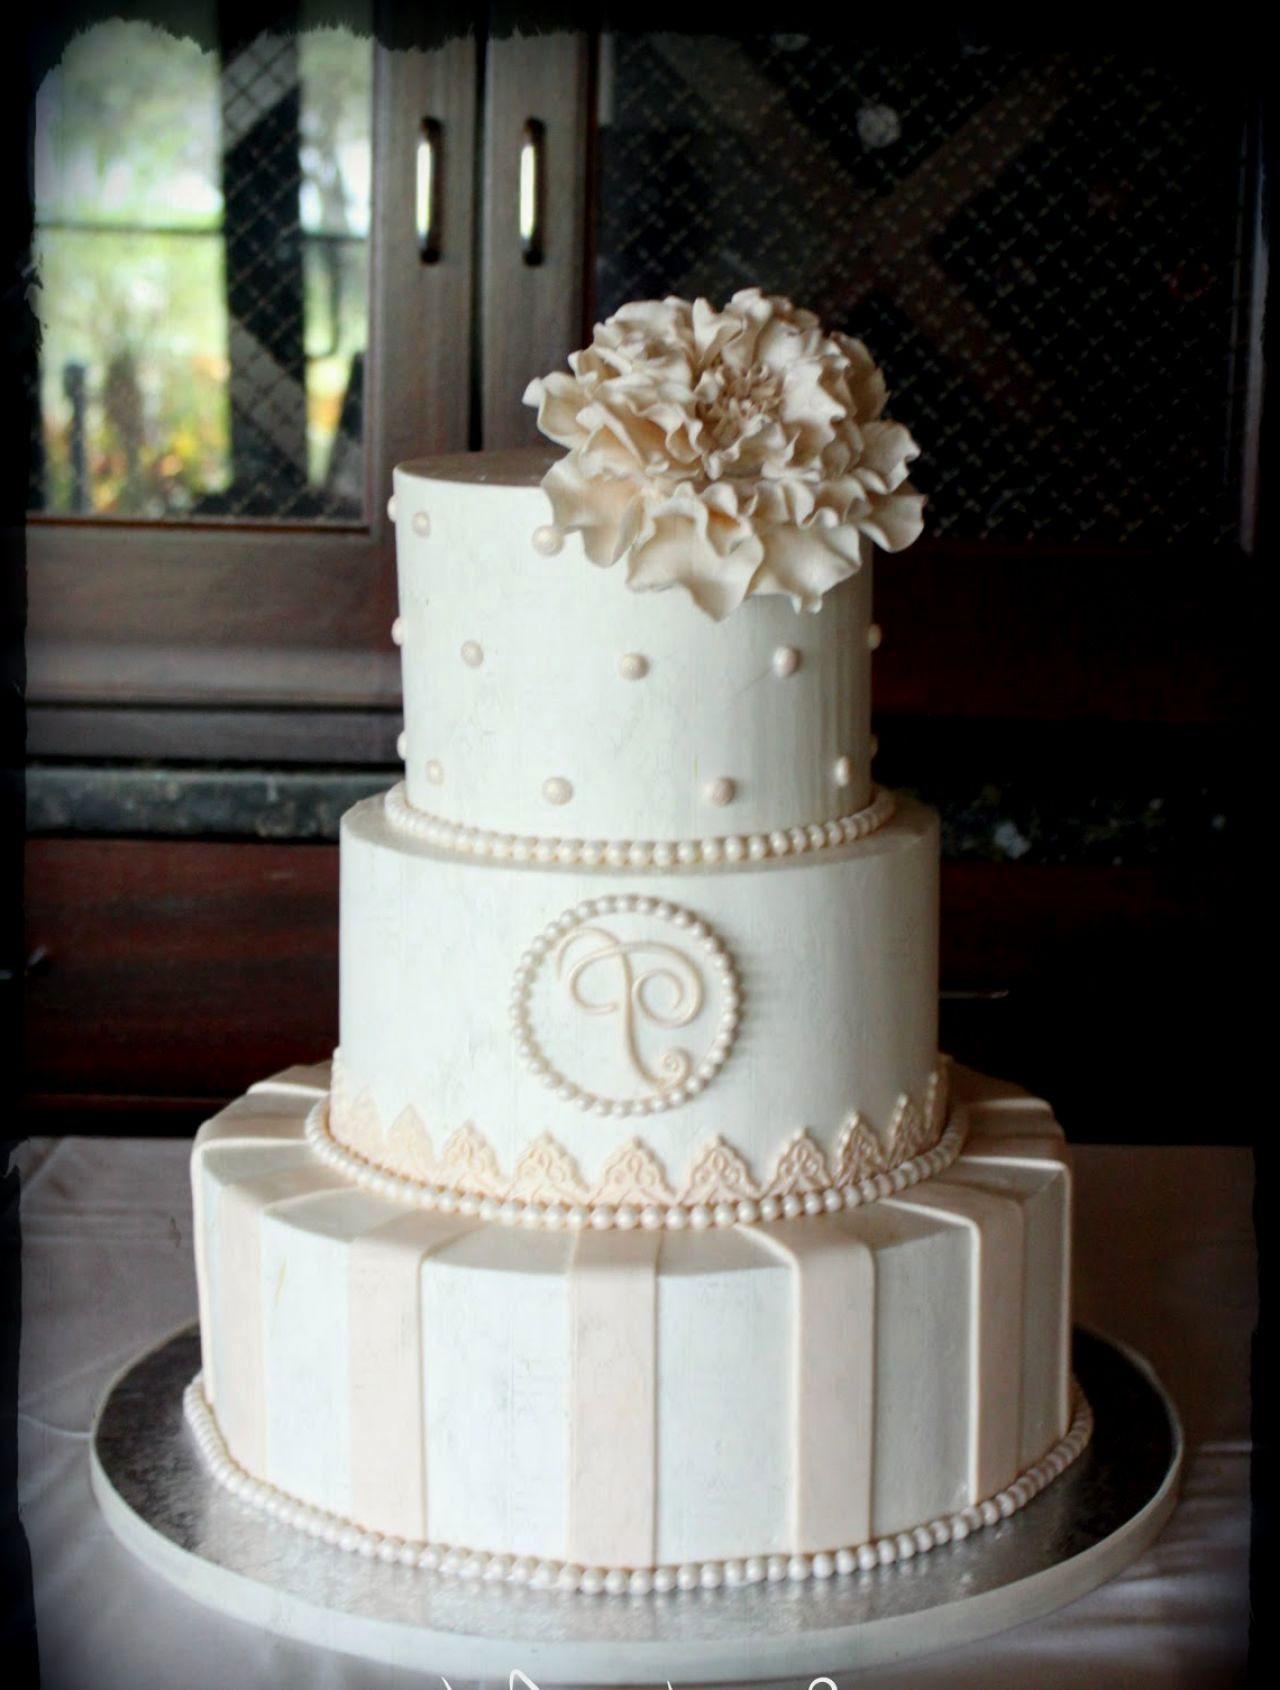 Simple Elegance Wedding Cakes  Elegant simple wedding cakes idea in 2017